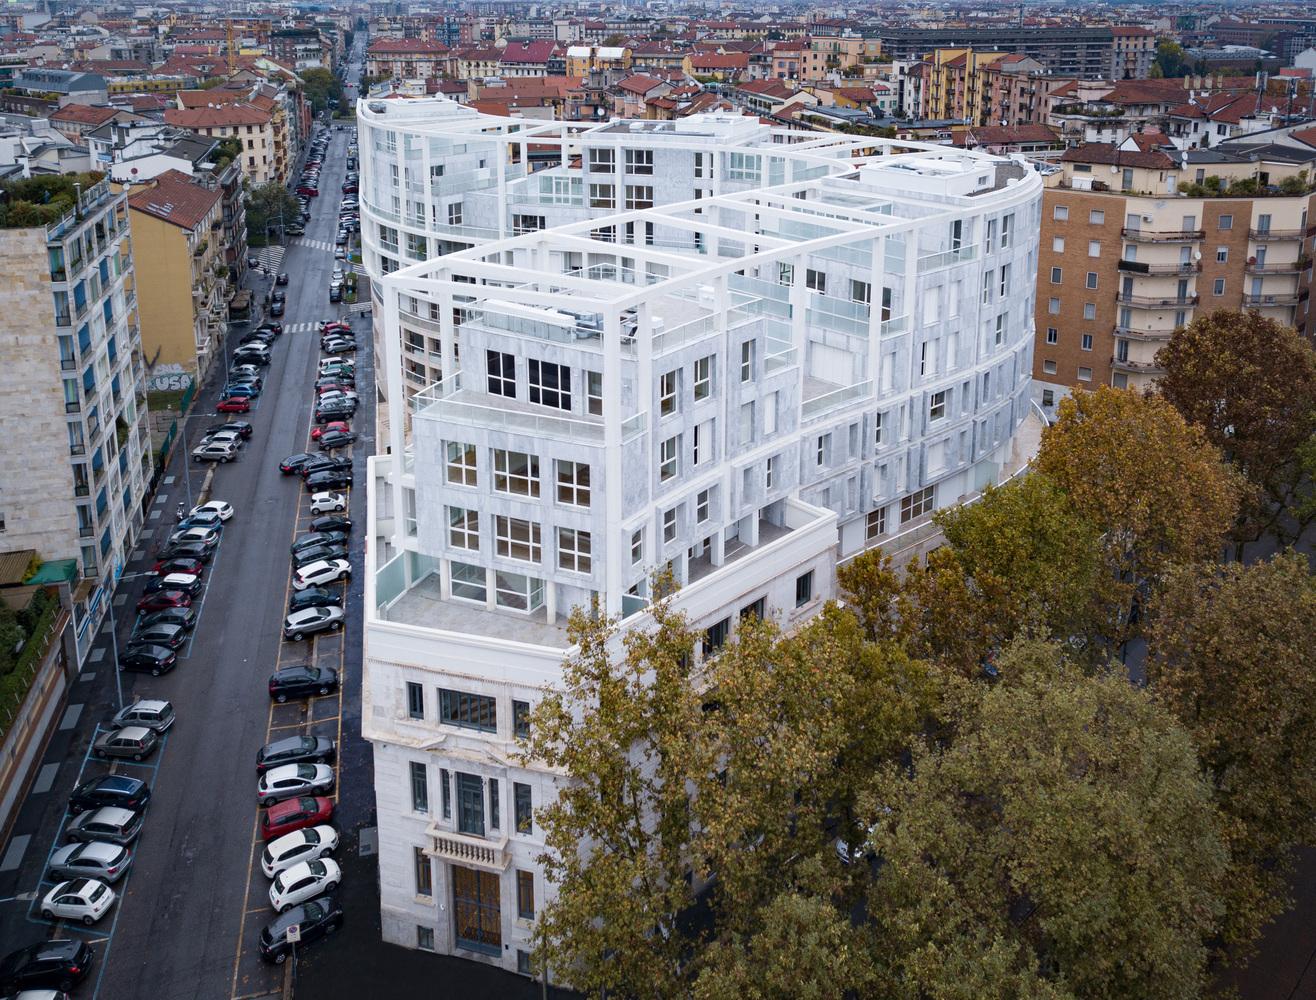 Residenze Carlo Erba / Eisenman Architects + Degli Esposti Architetti + AZstudio